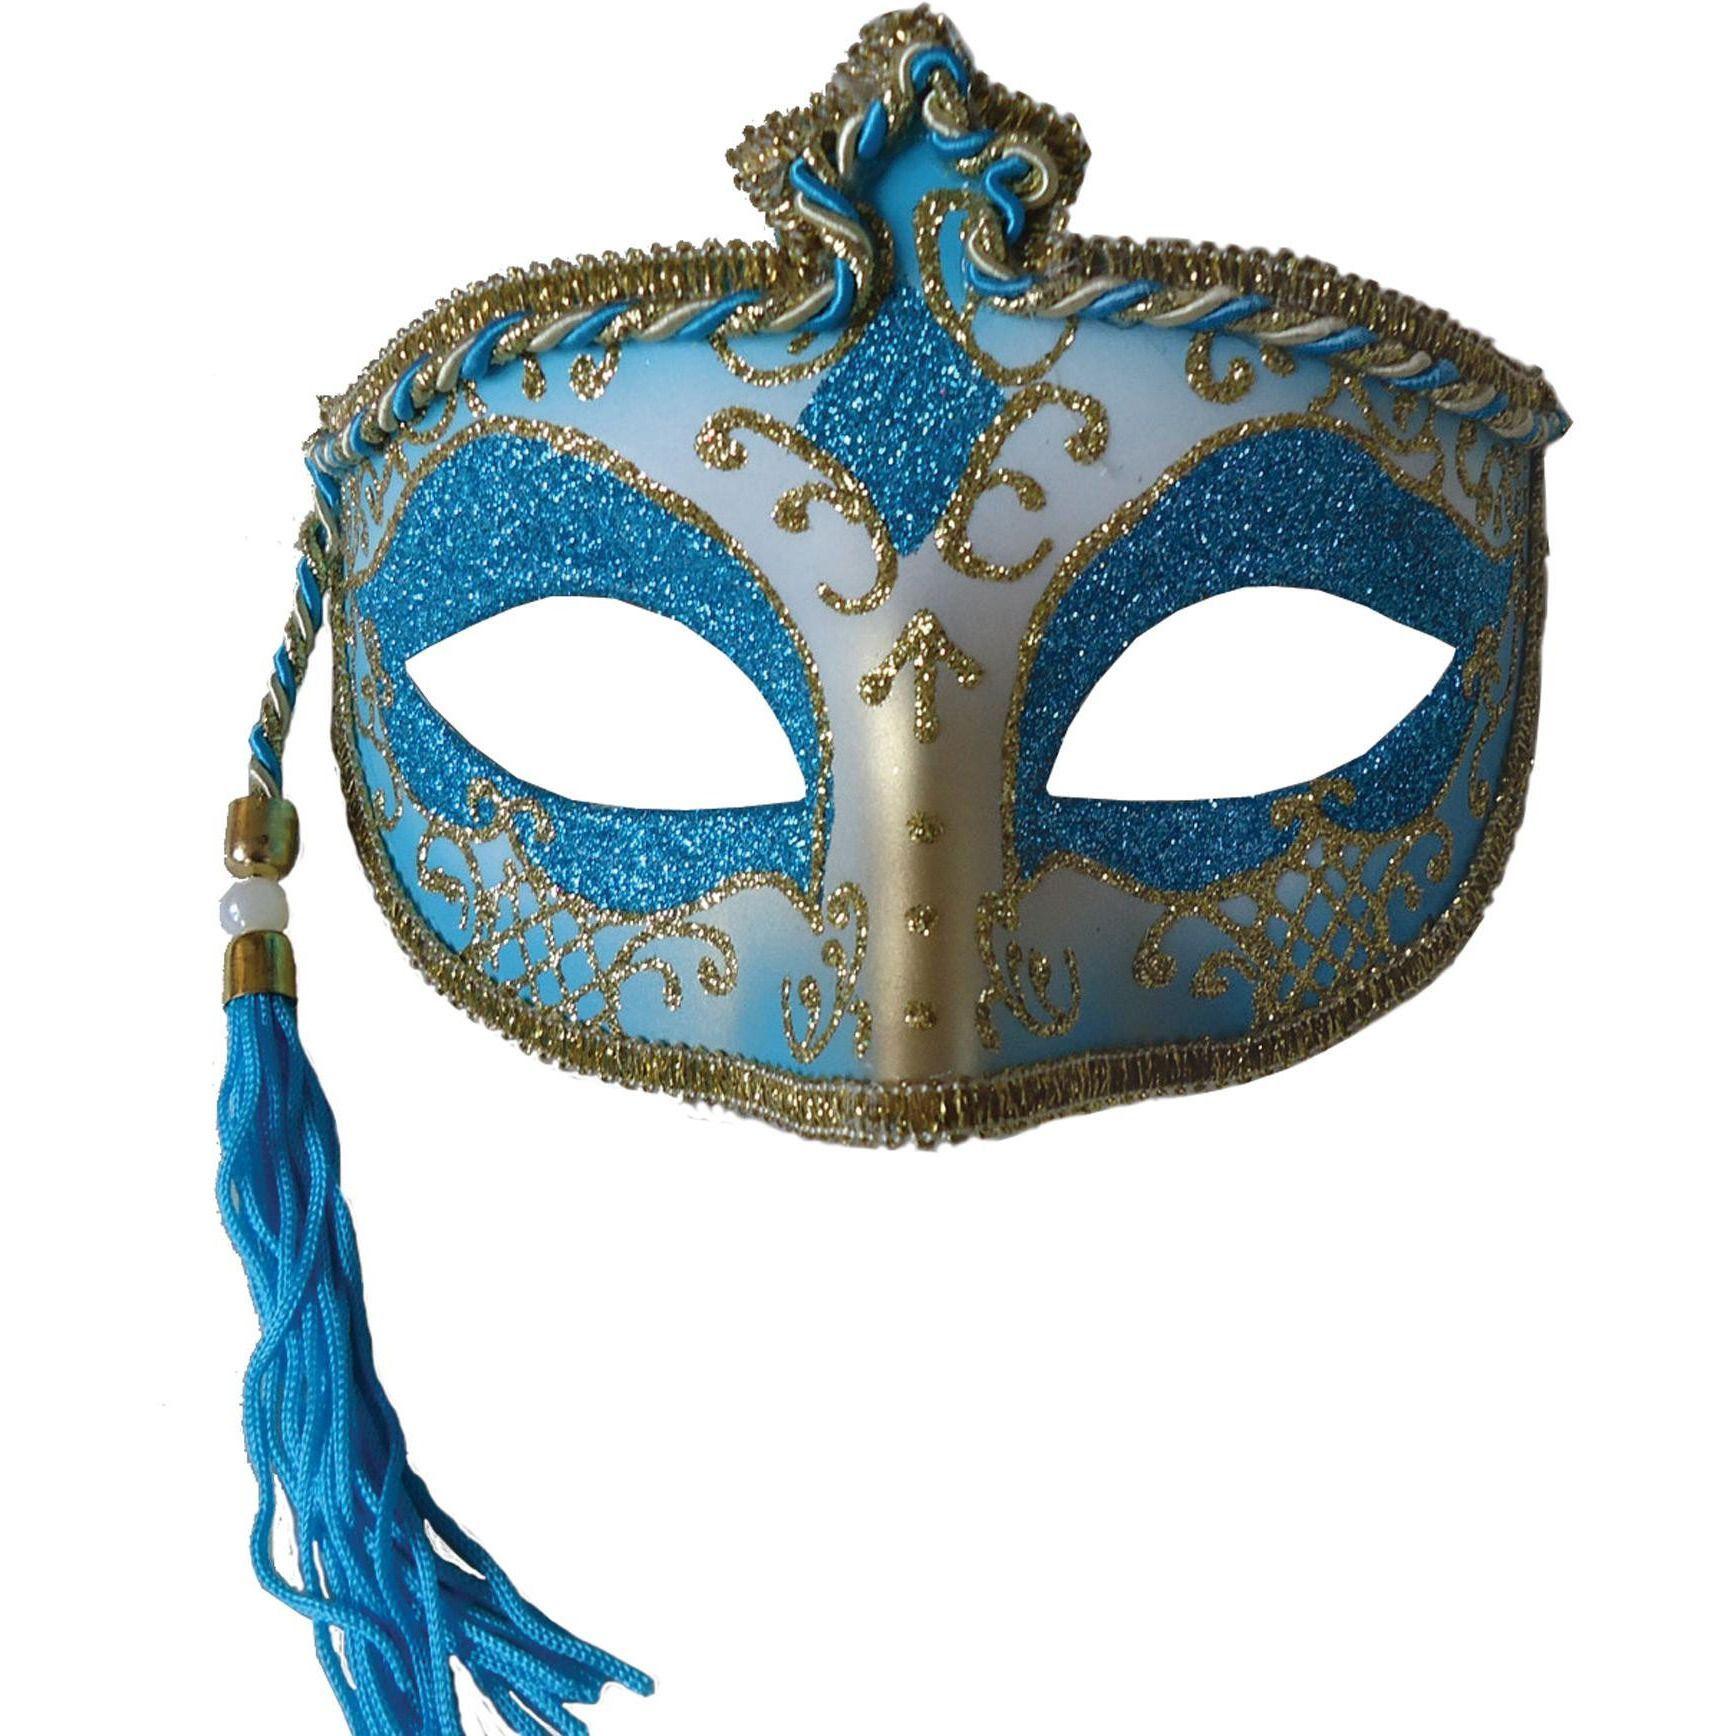 Tasseled Mardi Gras Mask Blue